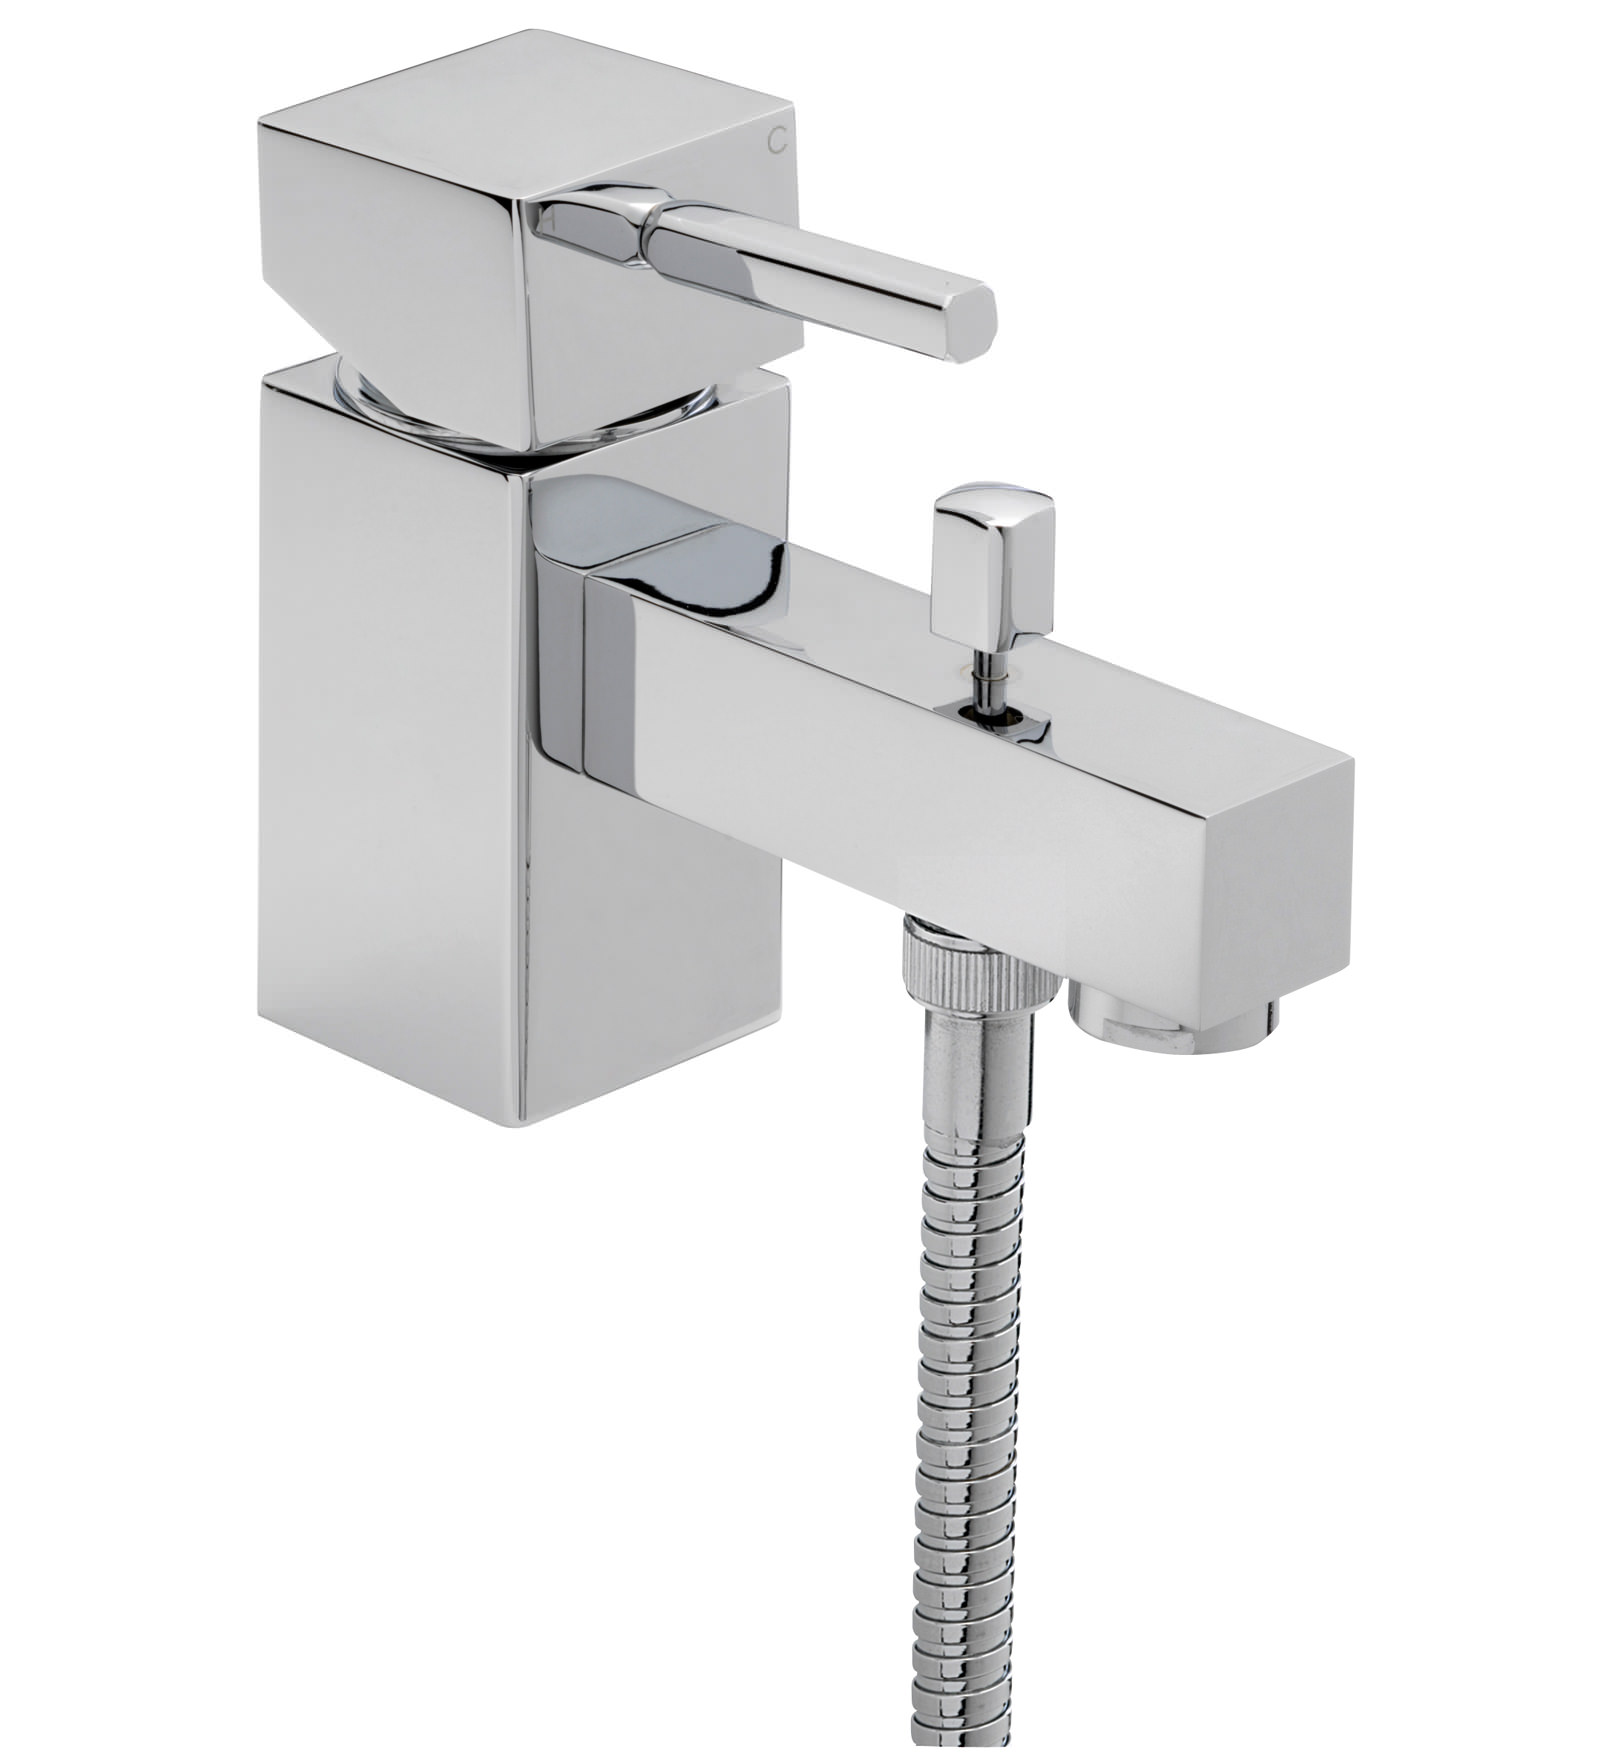 Sagittarius Pablo Monobloc Bath Shower Mixer Tap With Kit